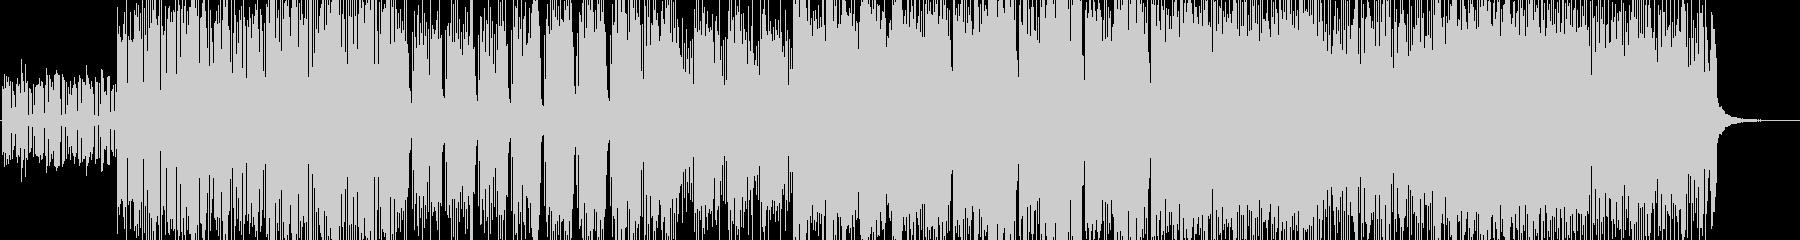 「HR/HM」「DARK」BGM45の未再生の波形